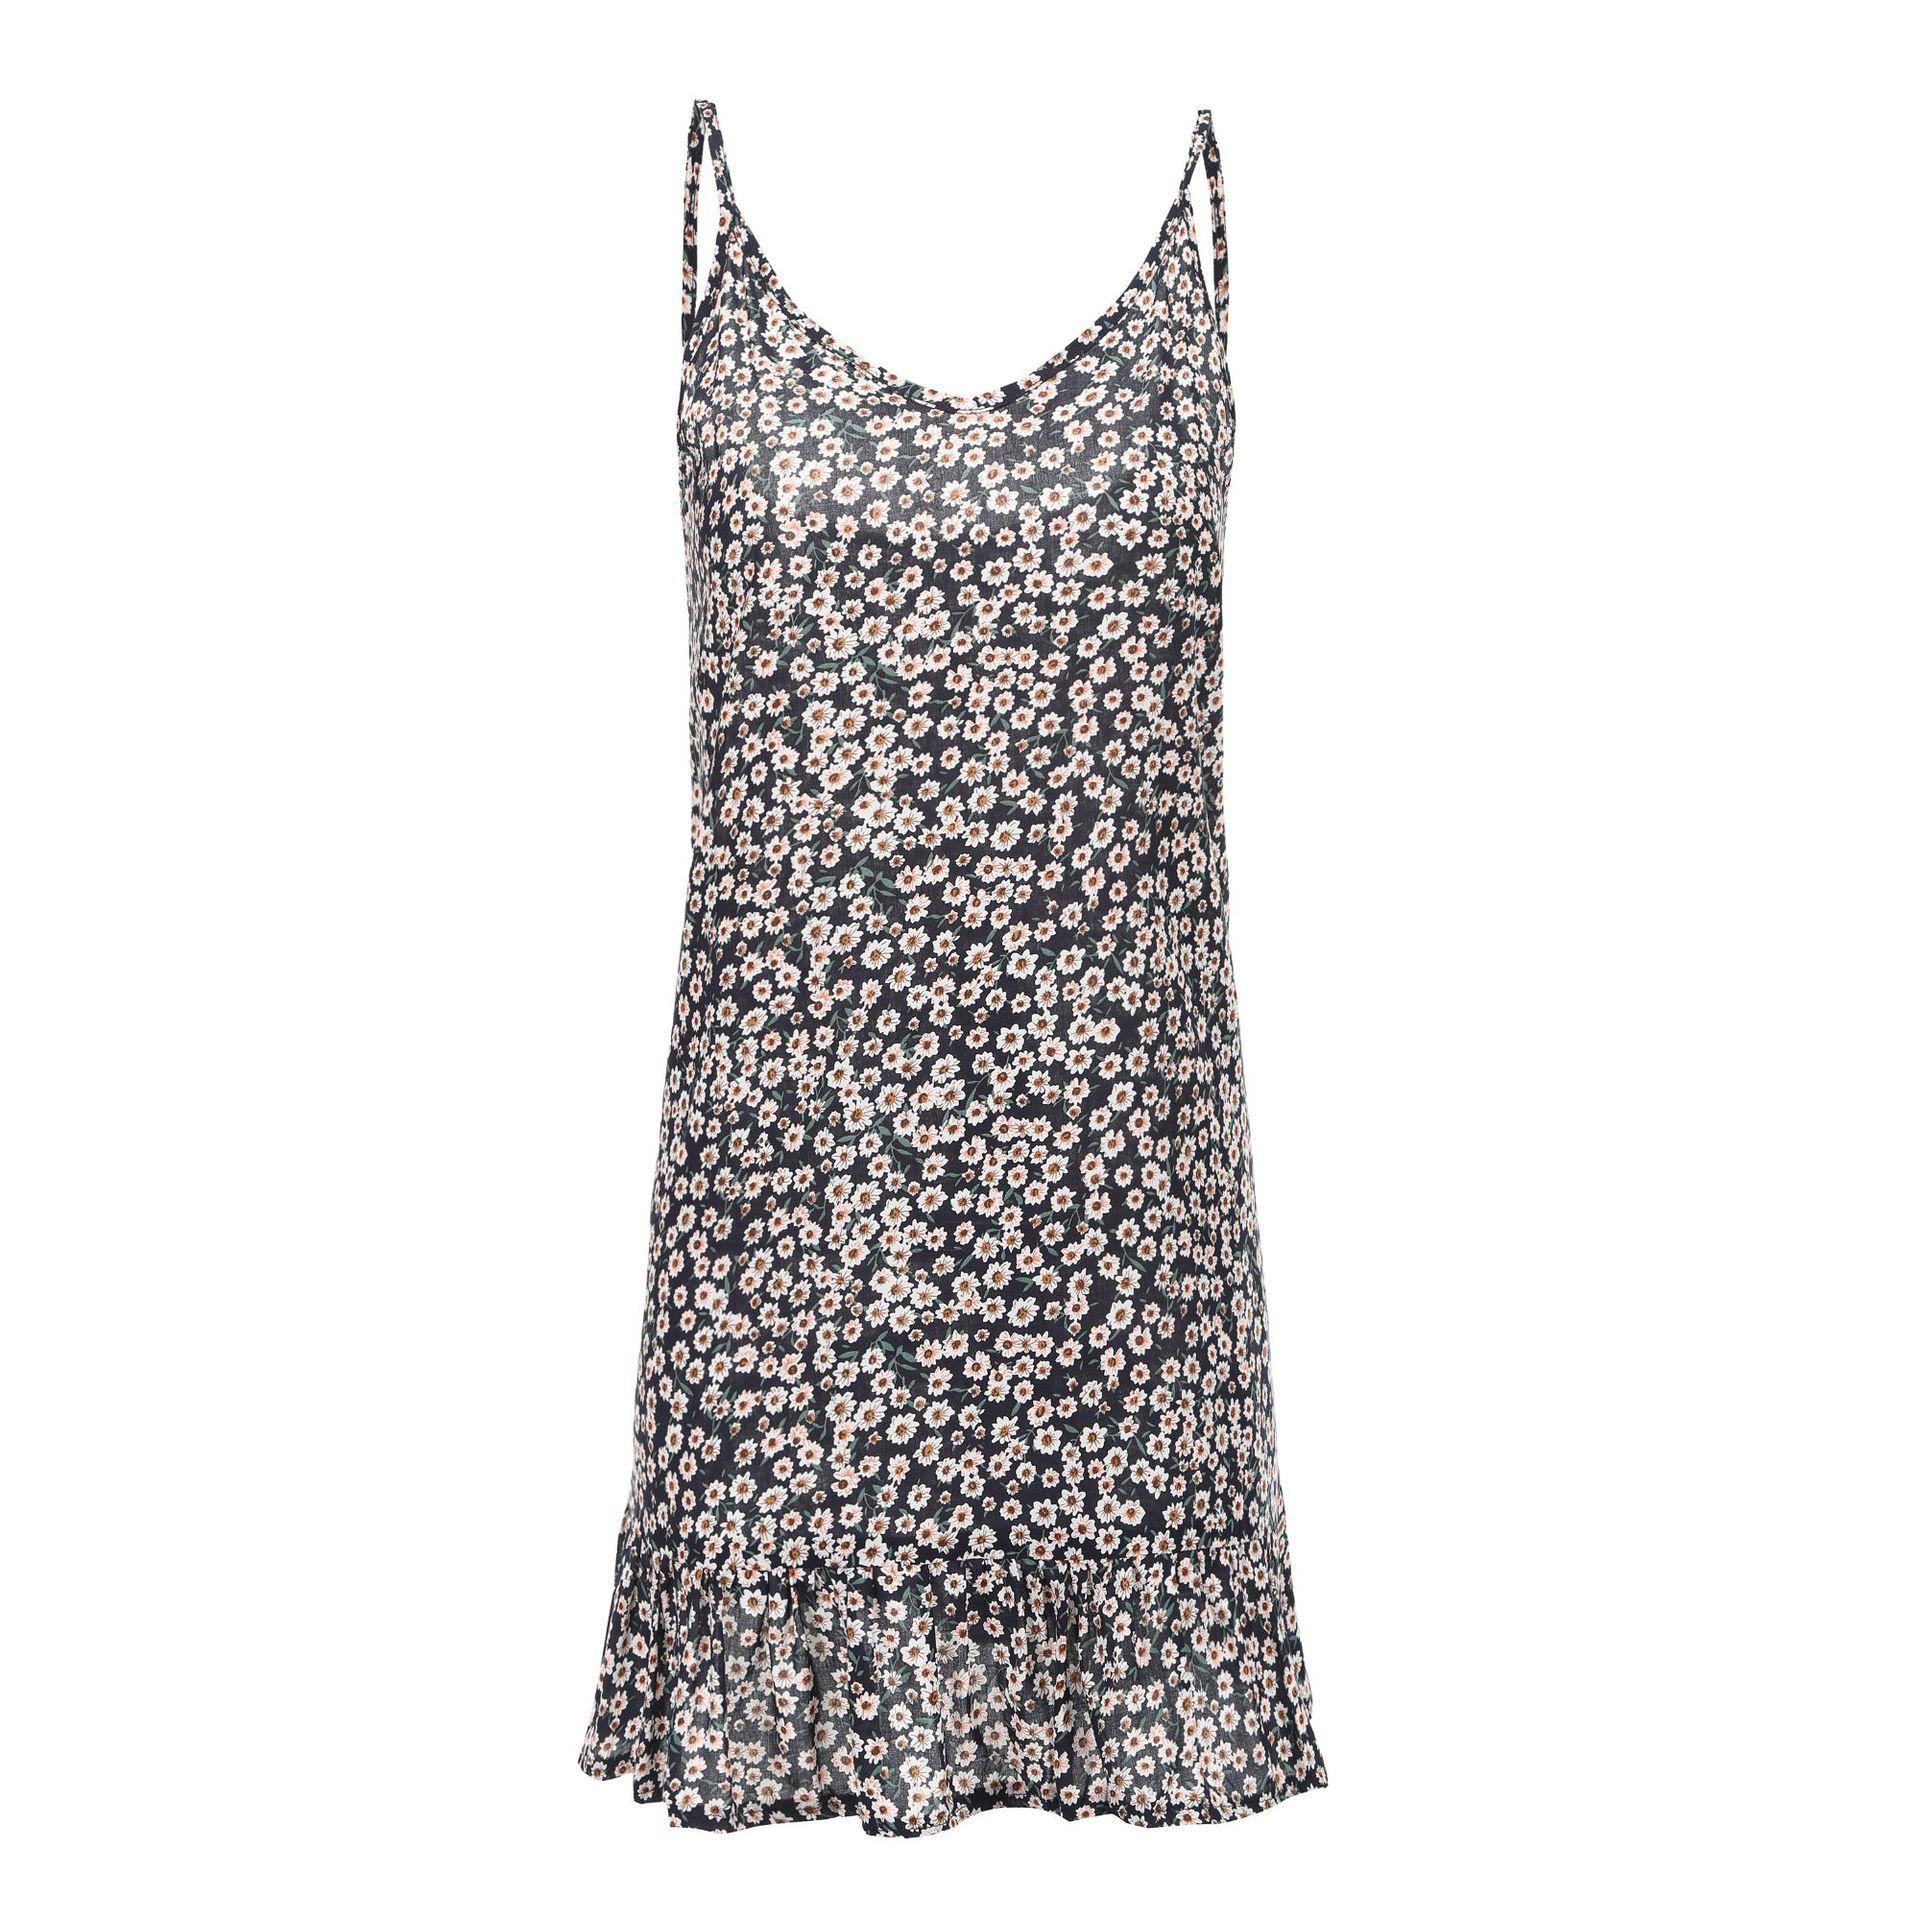 Loose Sexy Backless Women Dress Boho Strap Sleeveless Summer Dresses Casual Ruffles Mini Beach Dress Print Party Vestido 2019 in Dresses from Women 39 s Clothing